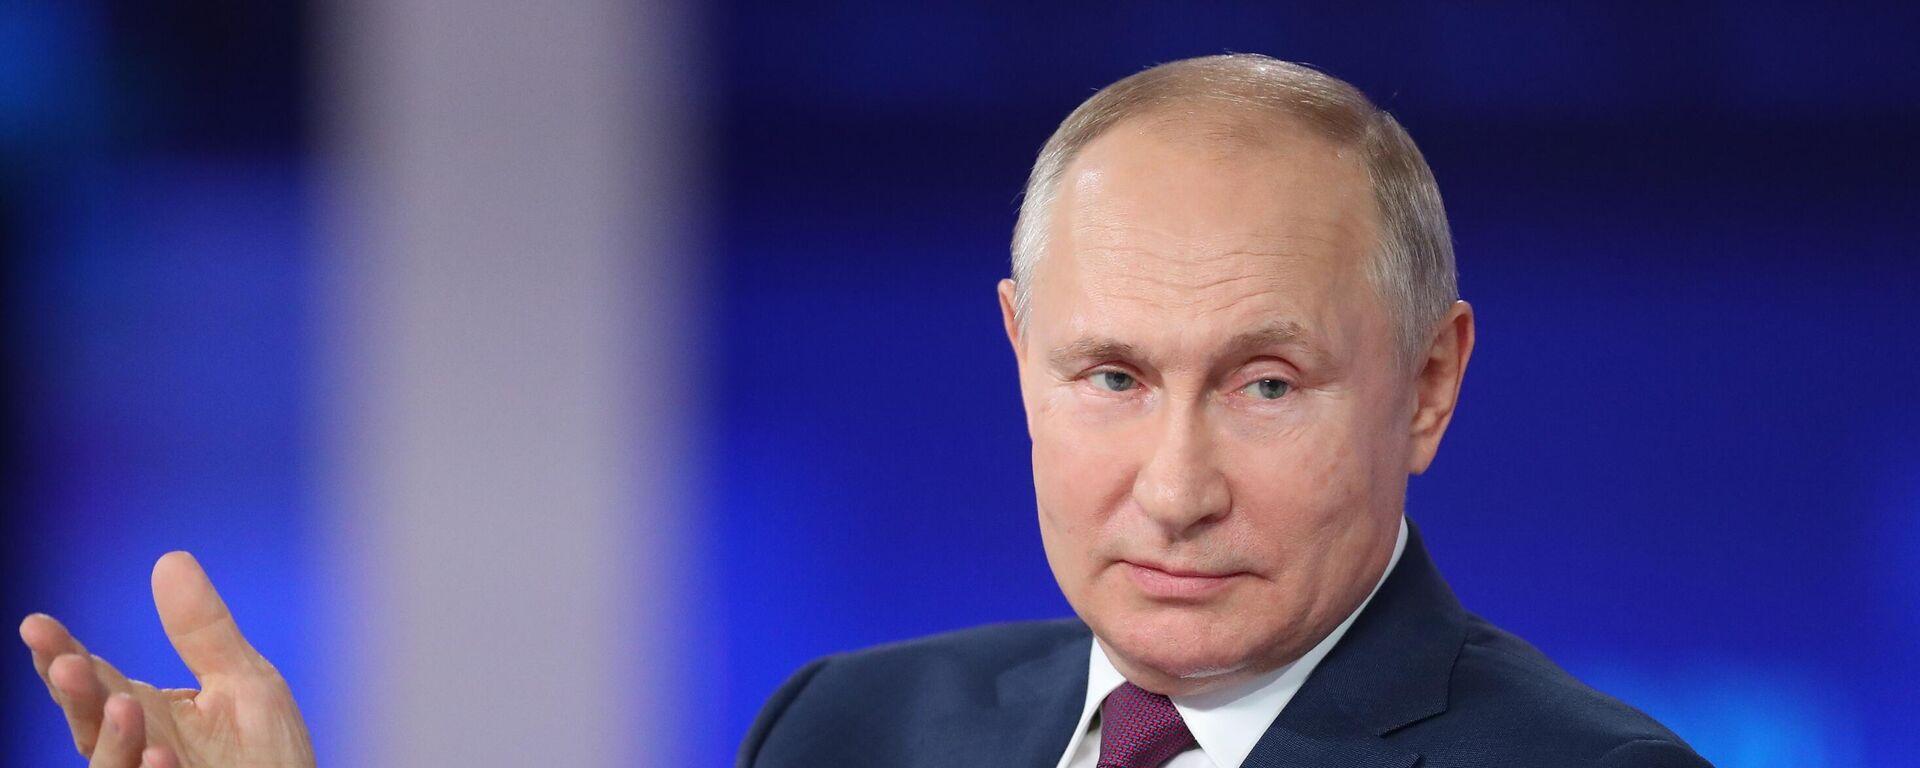 Línea directa con Vladímir Putin 2021 - Sputnik Mundo, 1920, 10.09.2021